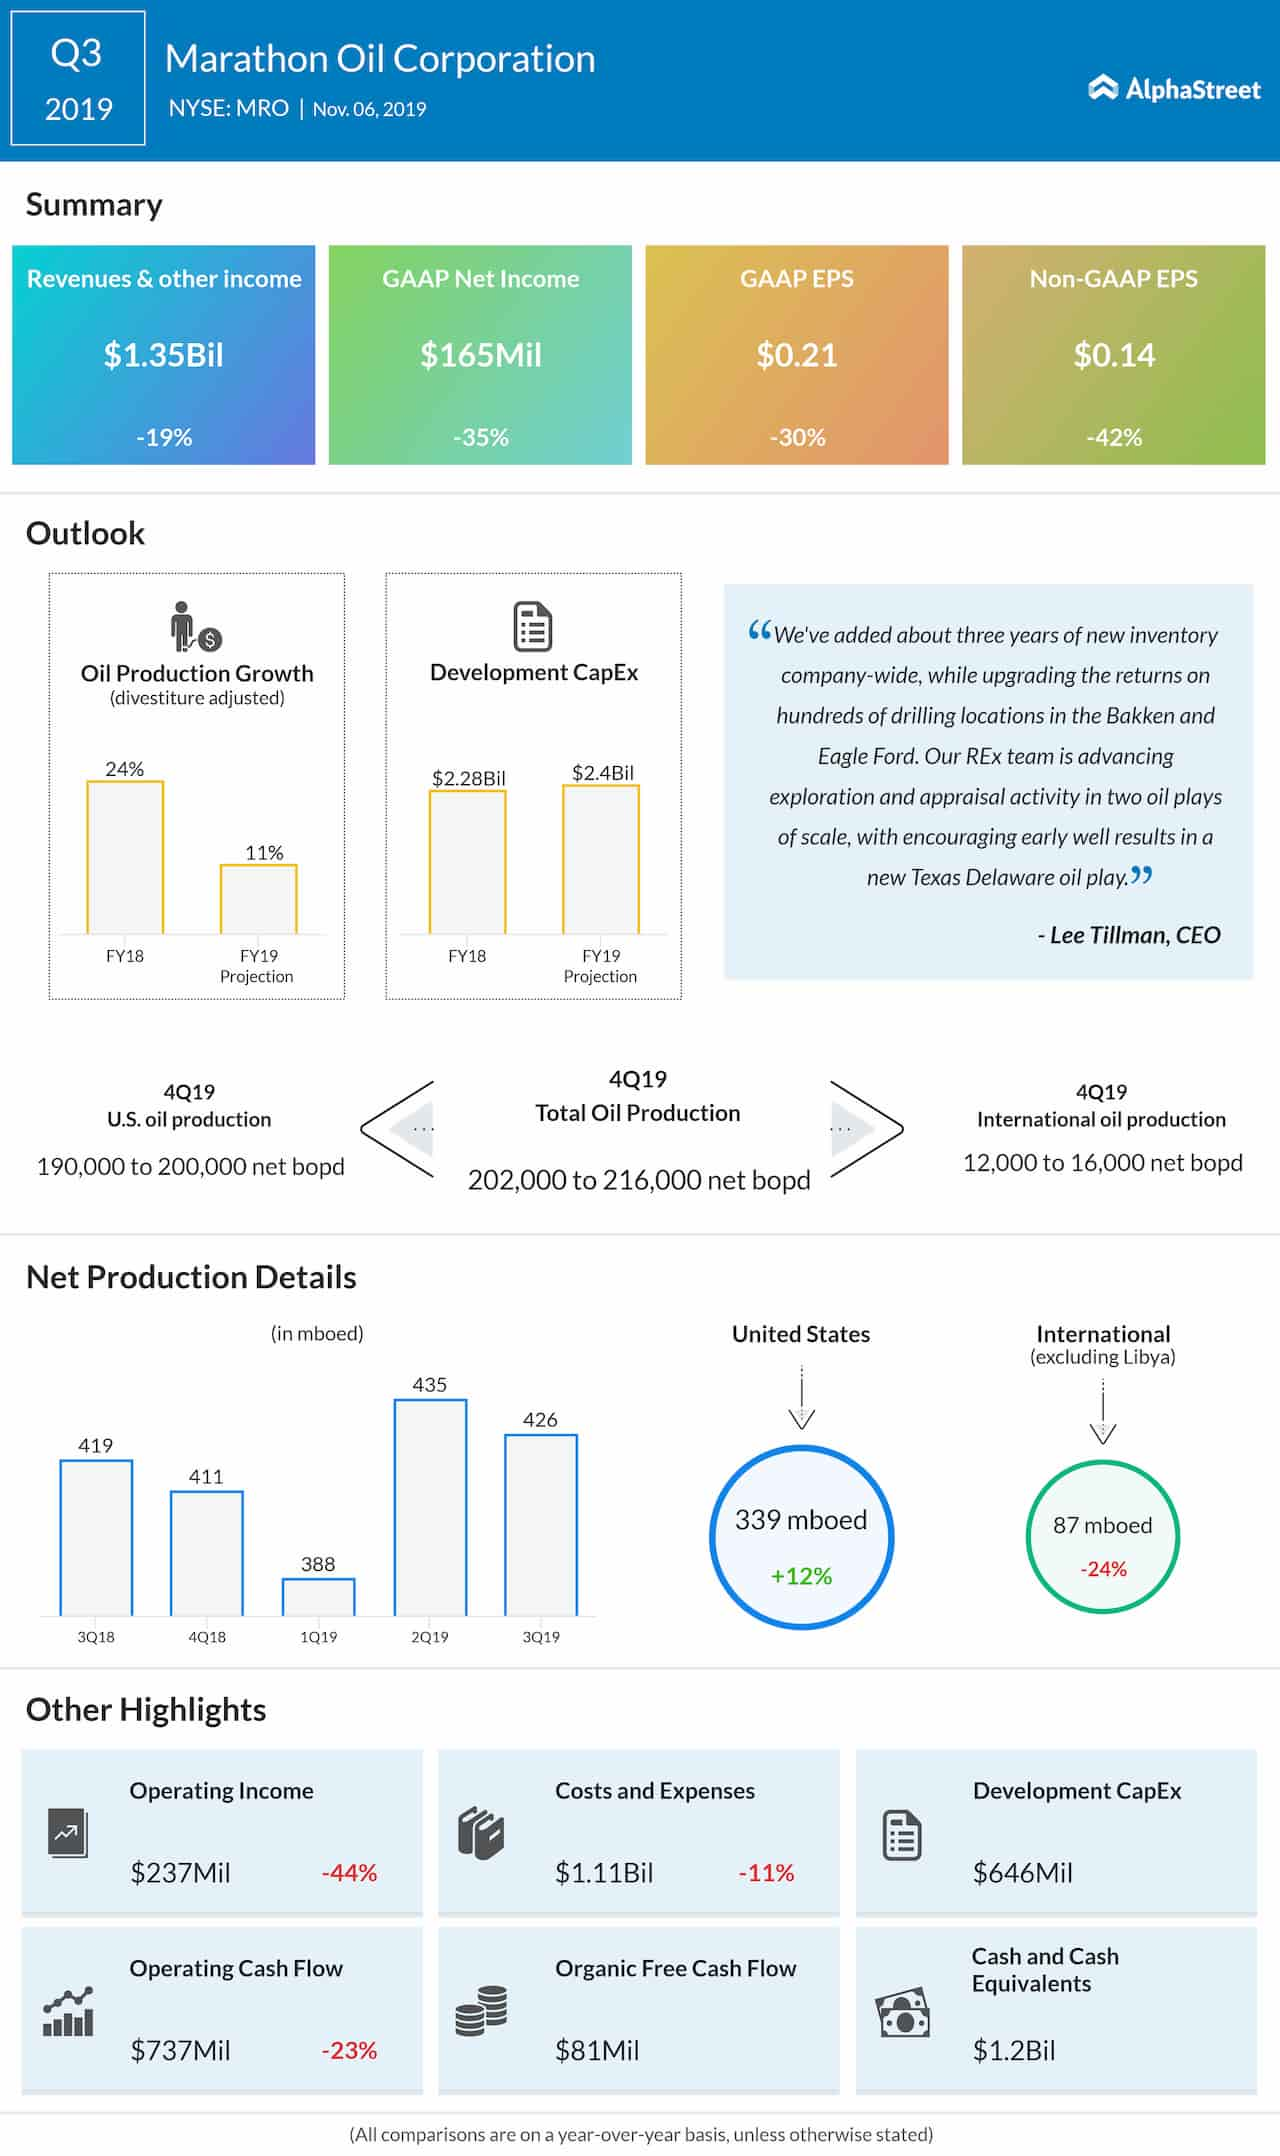 Marathon Oil Corporation (NYSE: MRO): Q3 2019 Earnings Snapshot